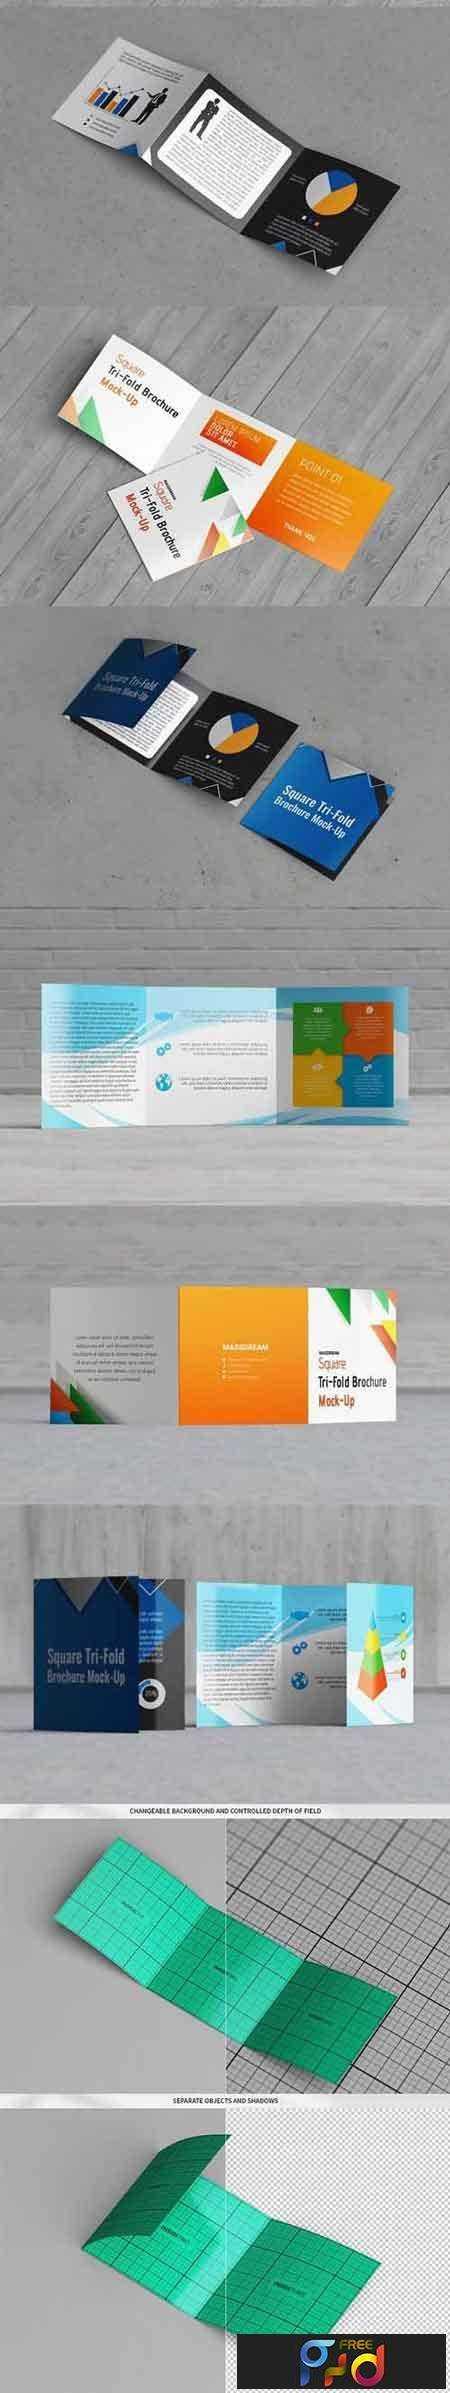 FreePsdVn.com_1705169_MOCKUP_square_trifold_brochure_mockup_1815421